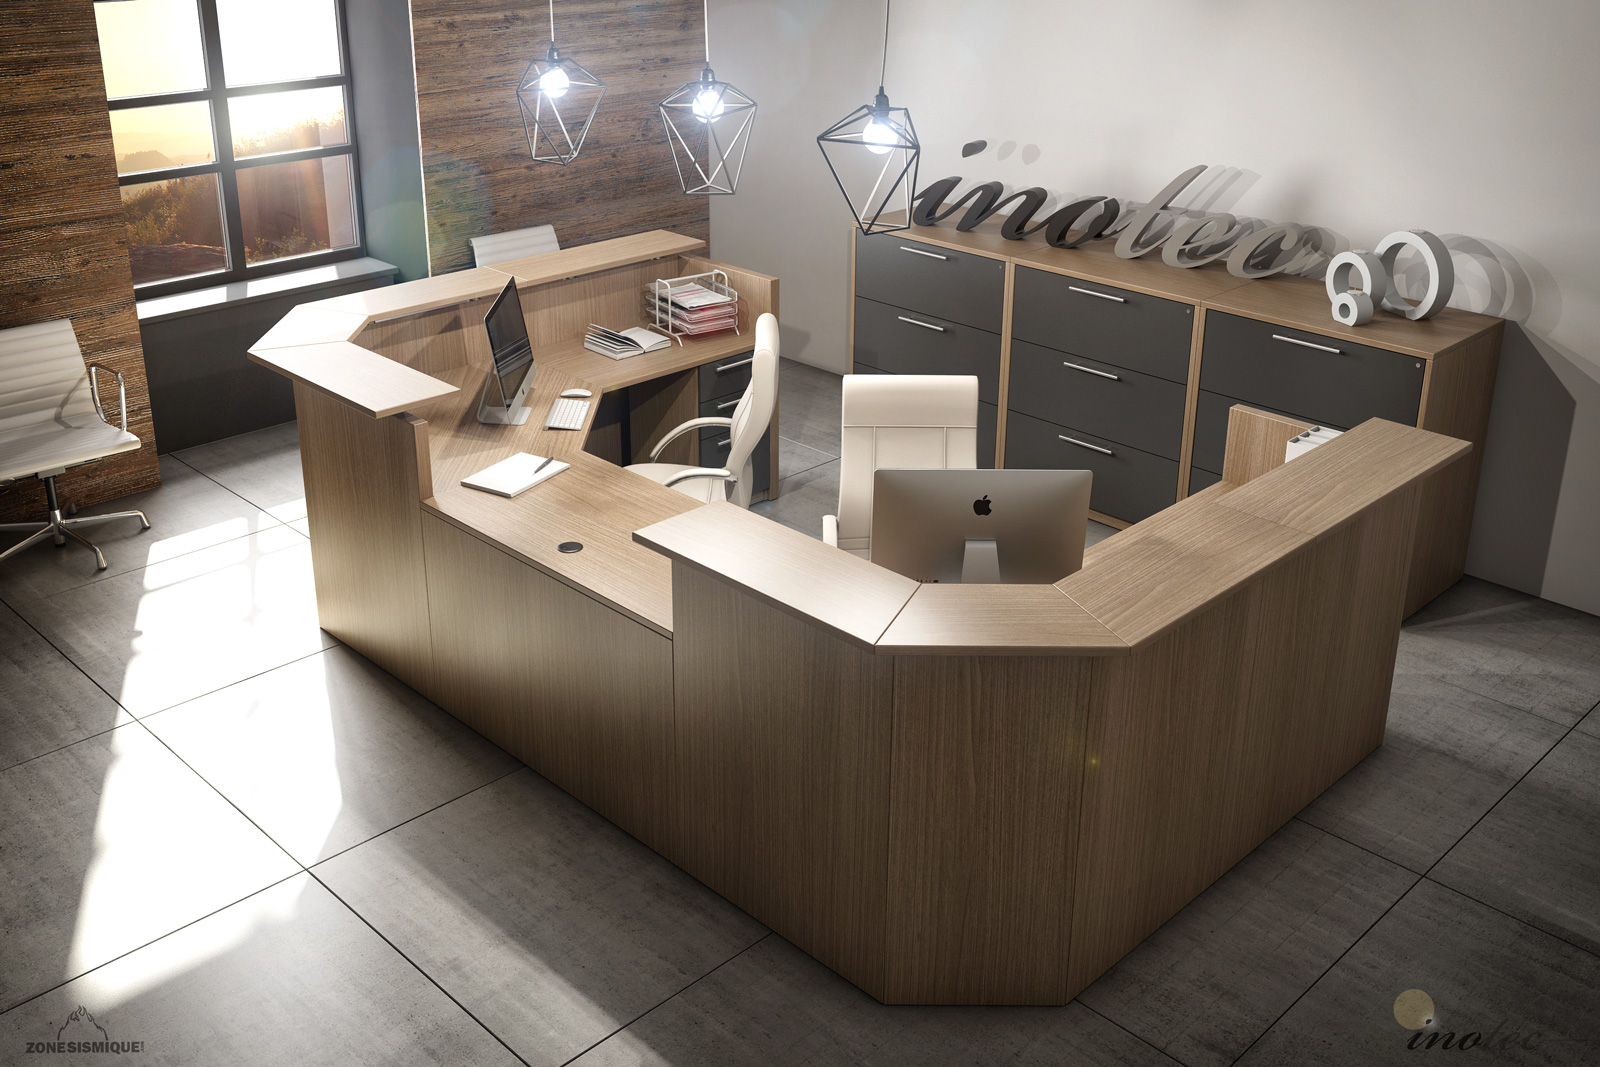 zone sismique inotec scene bureau 3d ypc 213 v1 zone. Black Bedroom Furniture Sets. Home Design Ideas